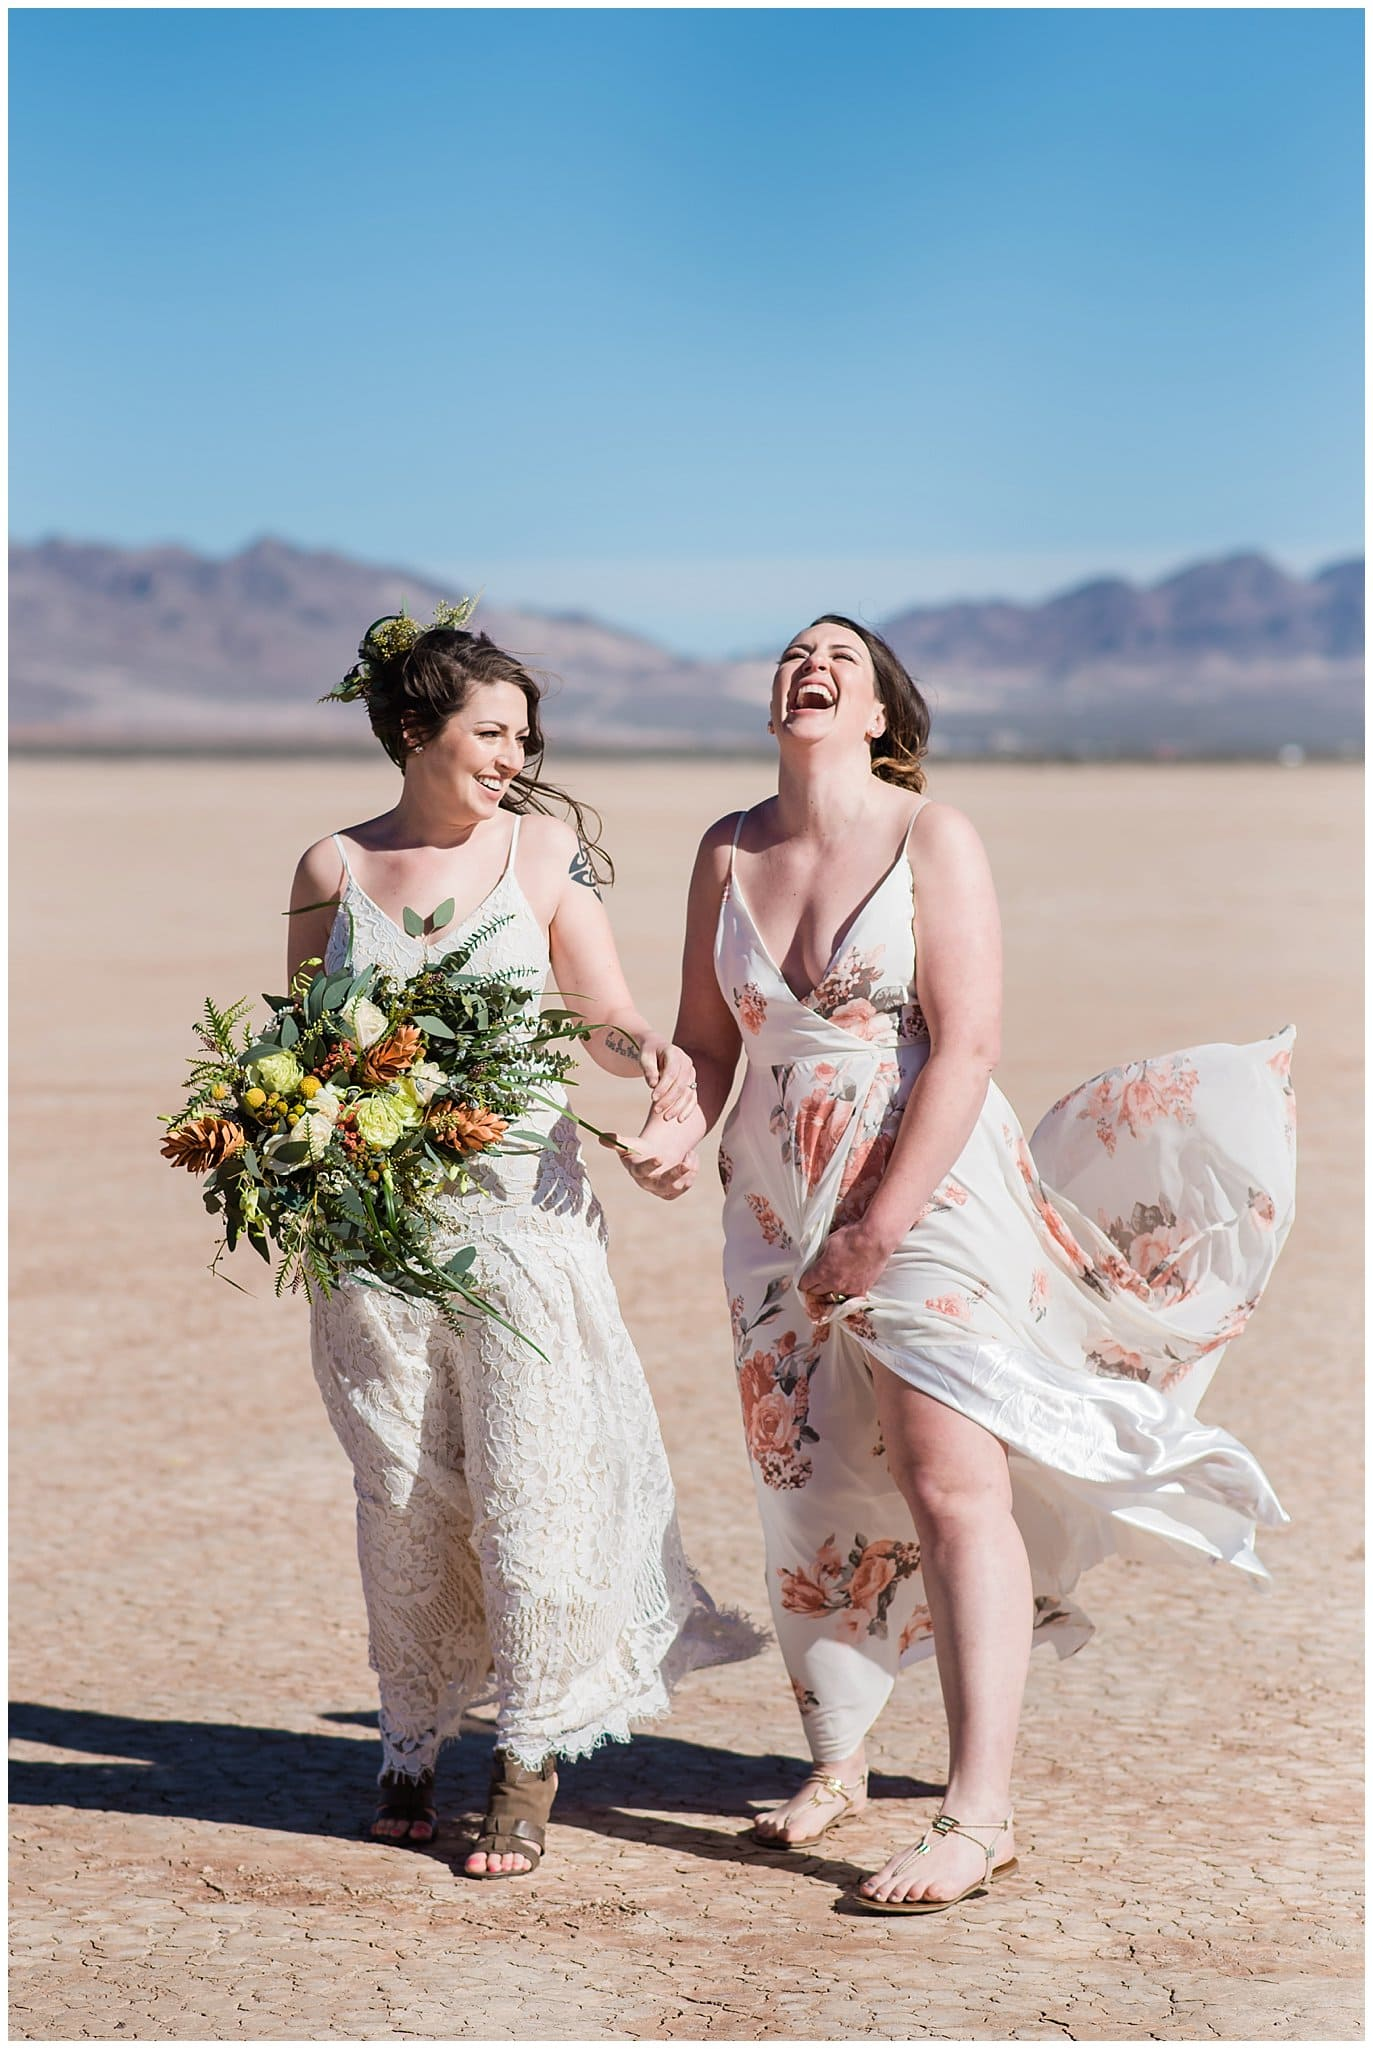 joyful brides laughing at Nevada dry lake beds elopement by Las Vegas elopement photographer Jennie Crate